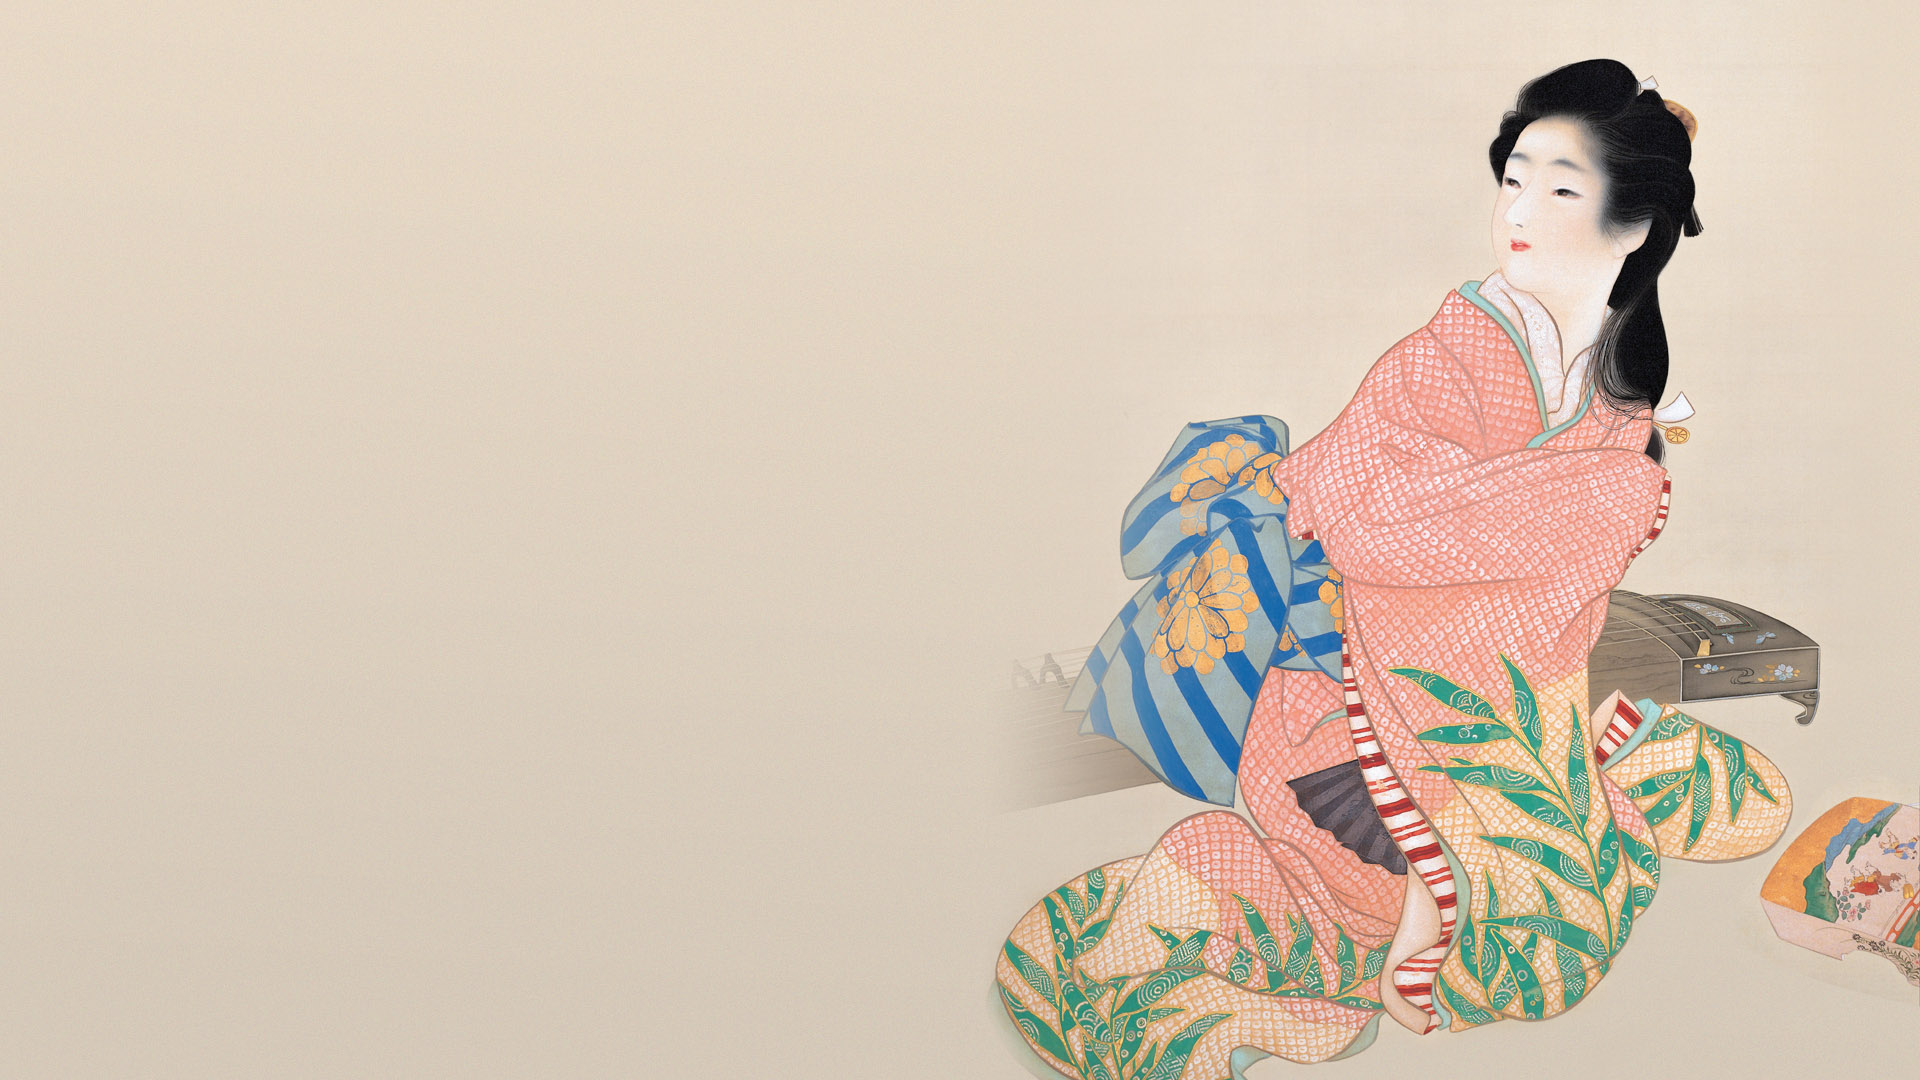 上村松園 娘深雪 Uemura shoen - Musume miyuki 1920x1080